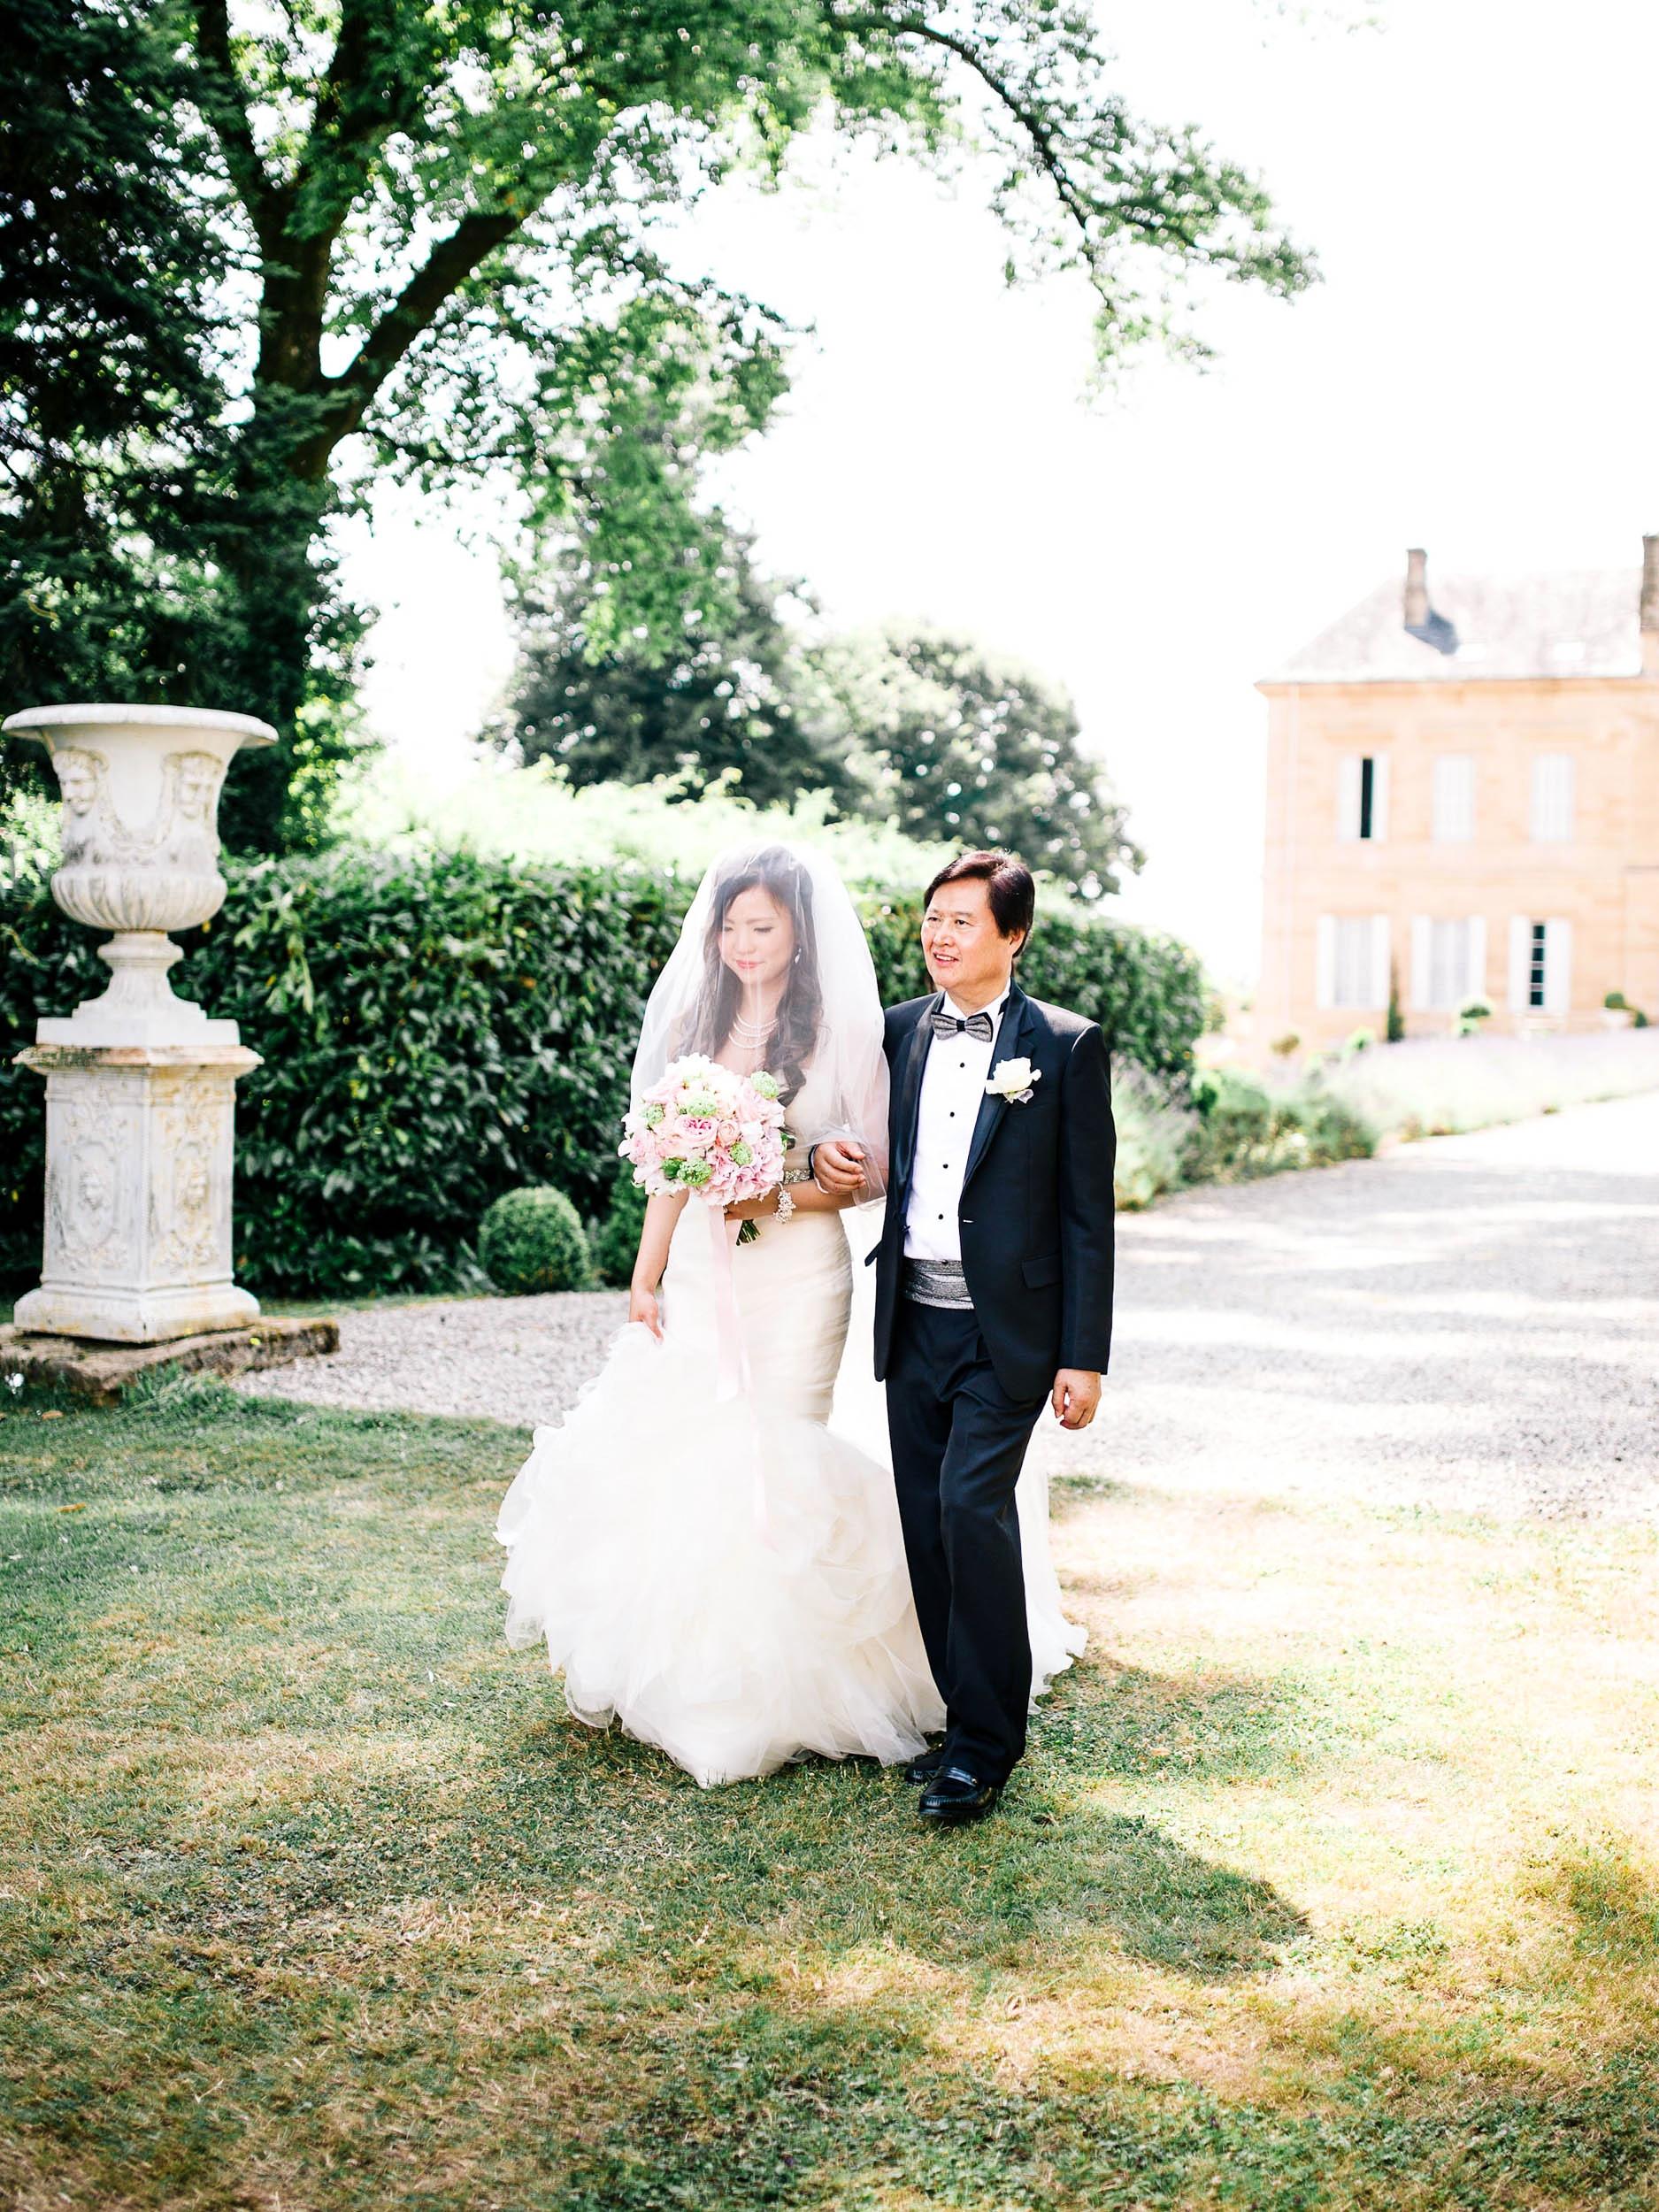 Amy O'Boyle Photography- Destination & UK Fine Art Film Wedding Photographer- Chateau La Durantie Wedding-10.jpg